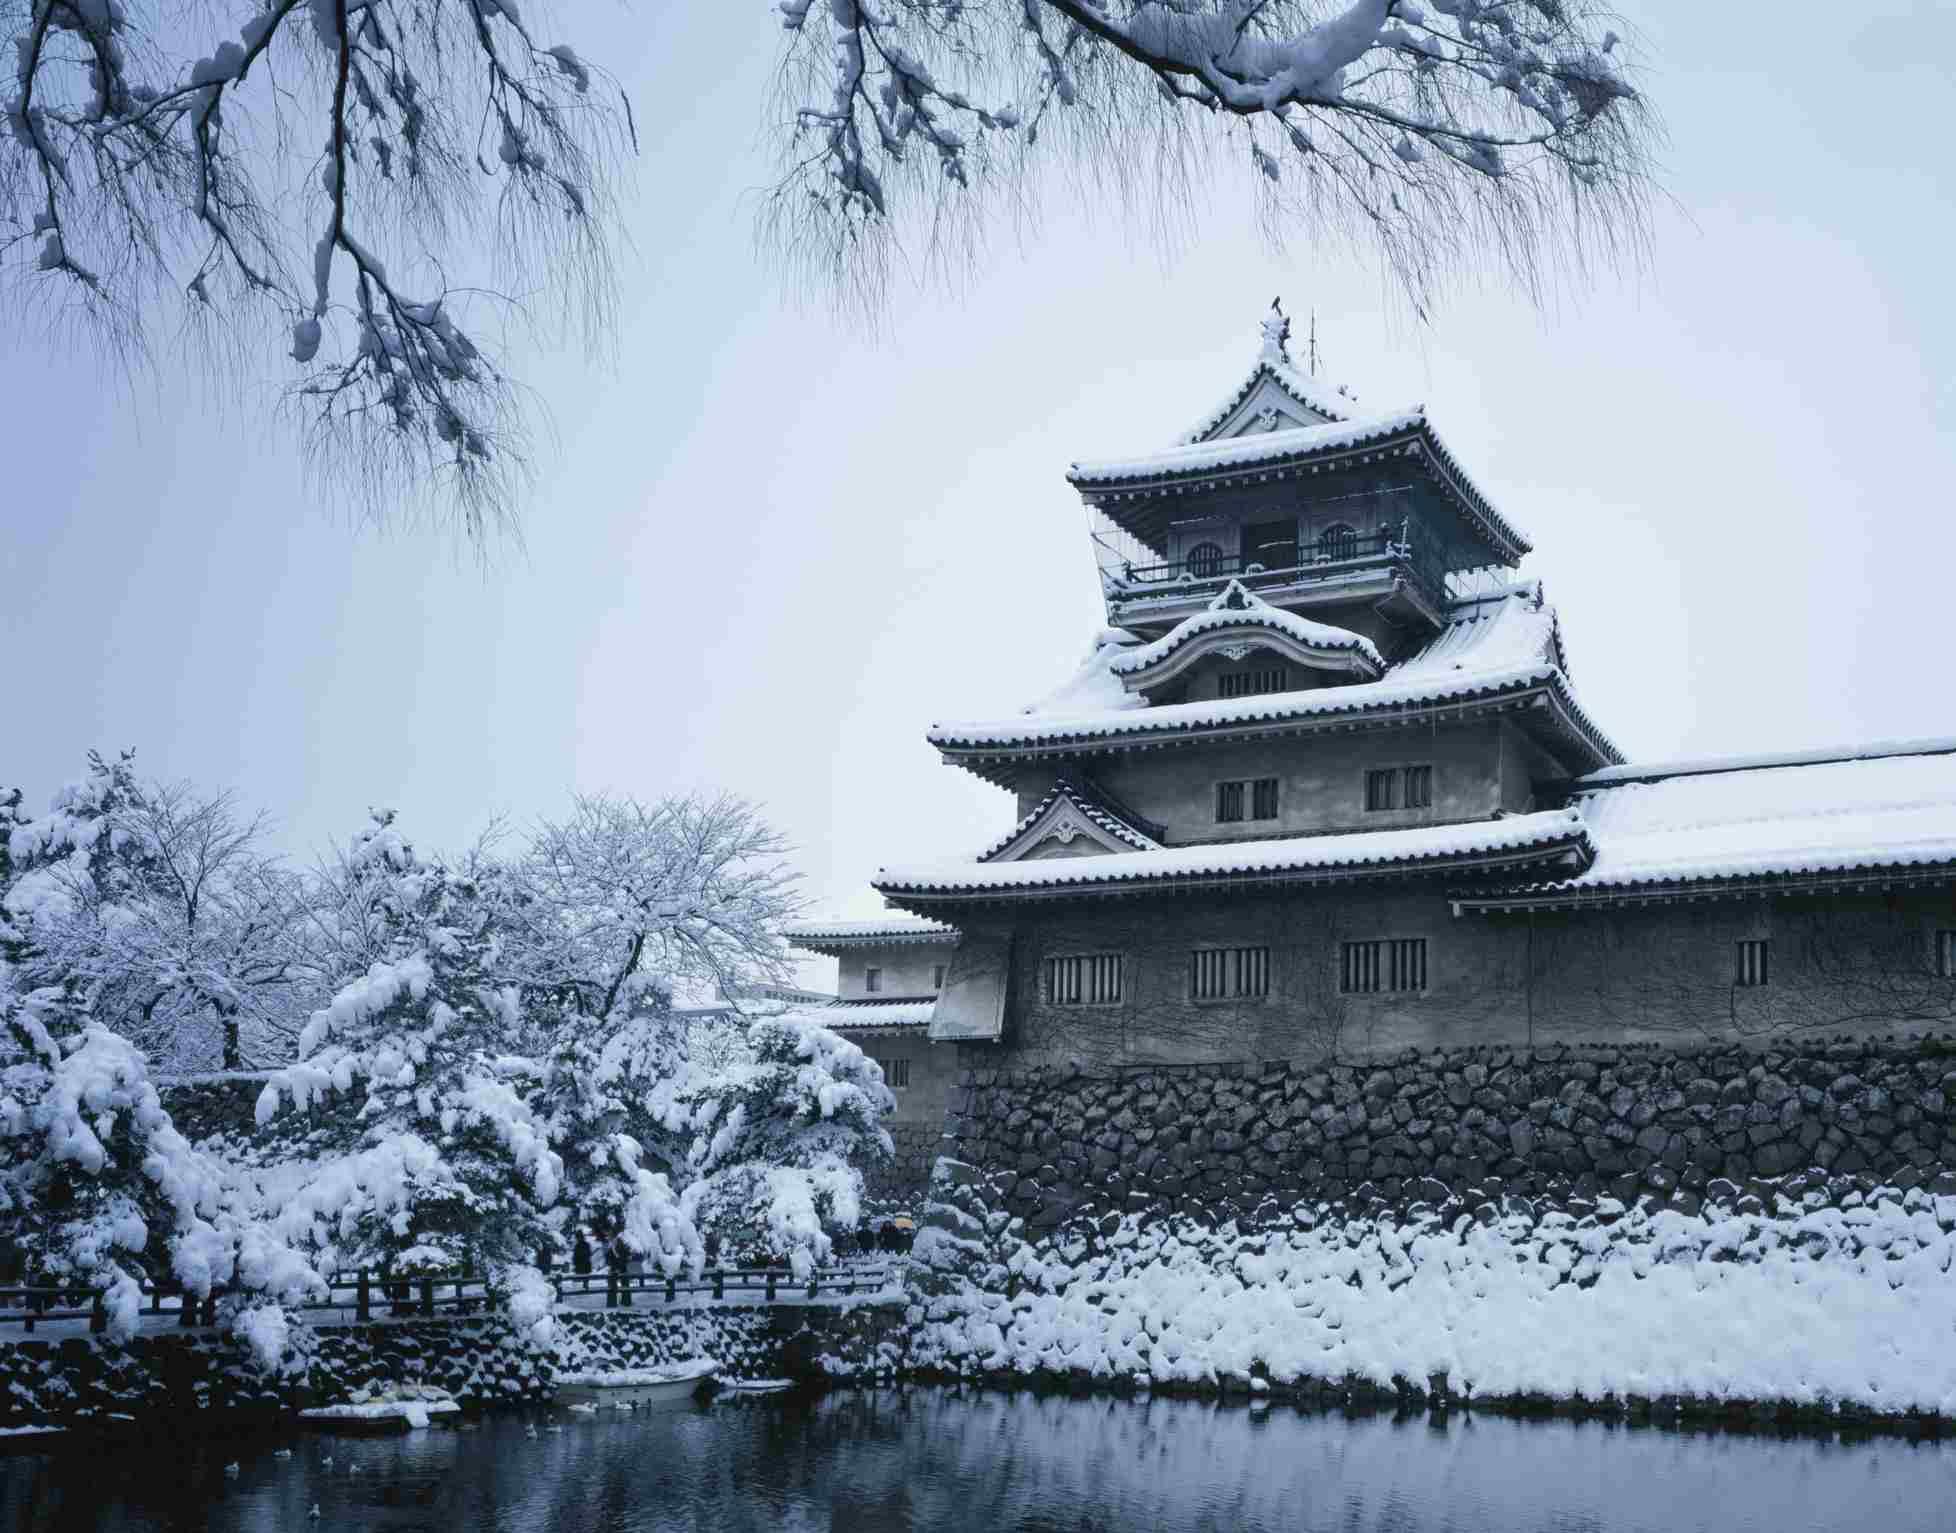 Japan, Toyama Prefecture, Toyama Castle, Snow covered trees near castle